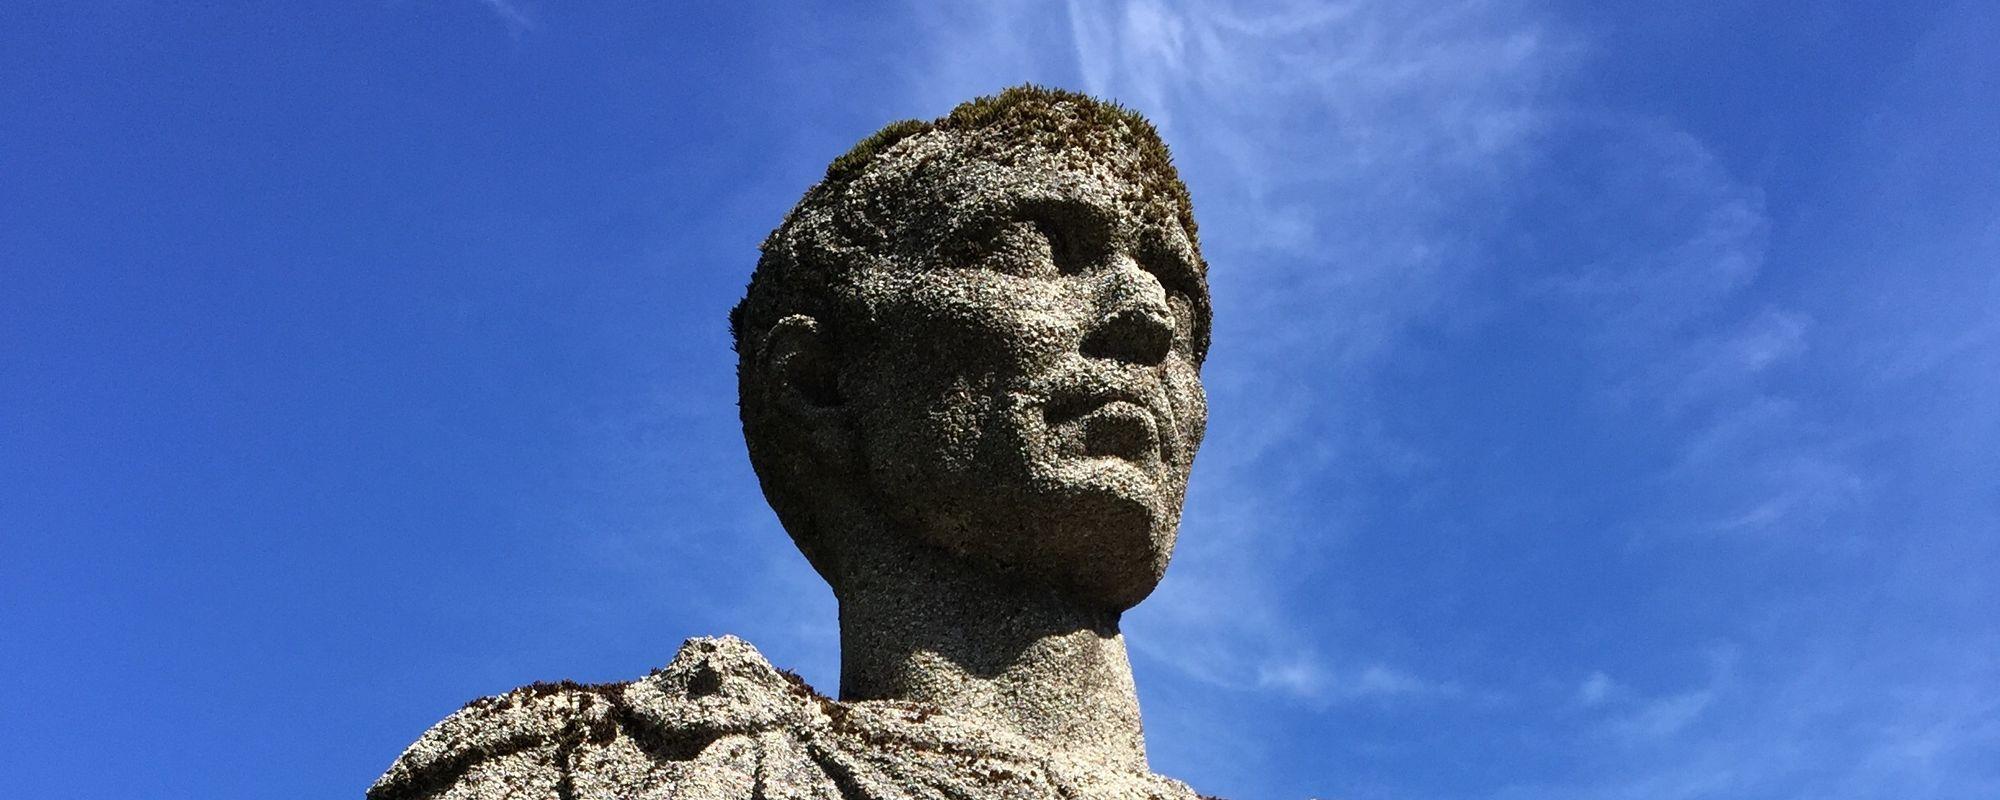 Upwards detail of a bust statue of a man